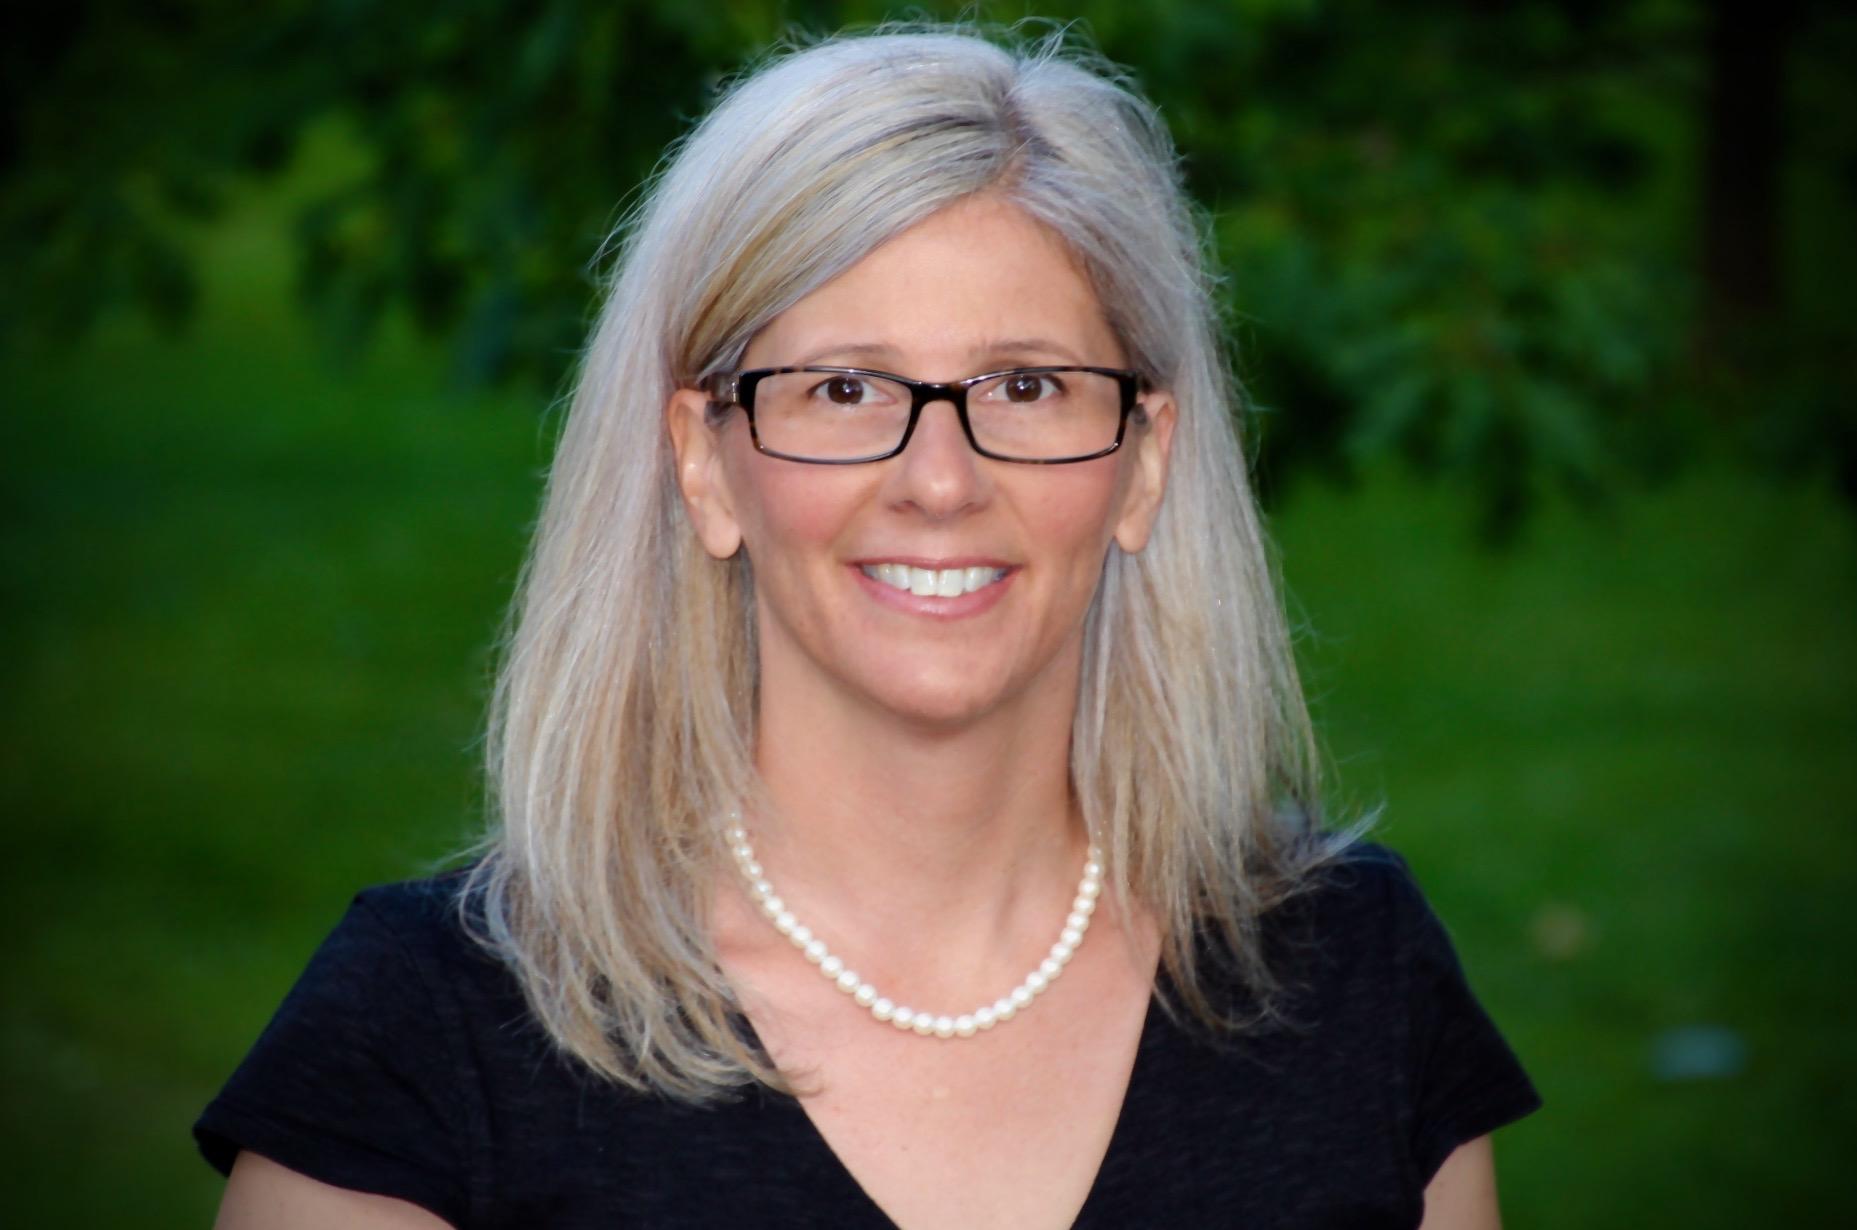 Allison Sutter